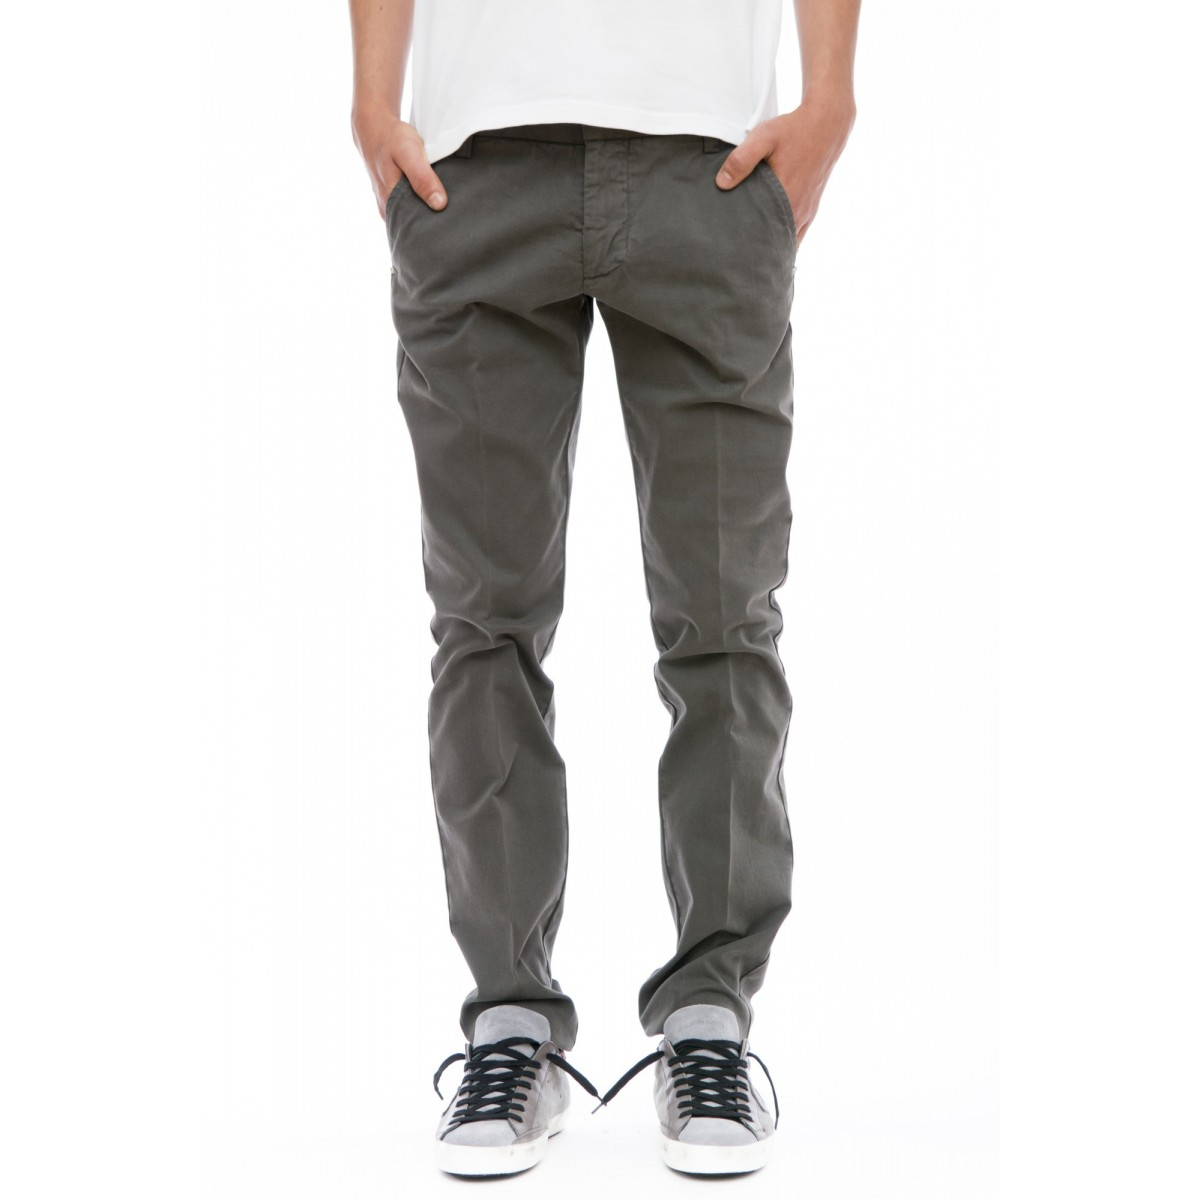 Pantalone uomo Entre amis - 8201/488l17 pantalone strech uomo gabardina lavata